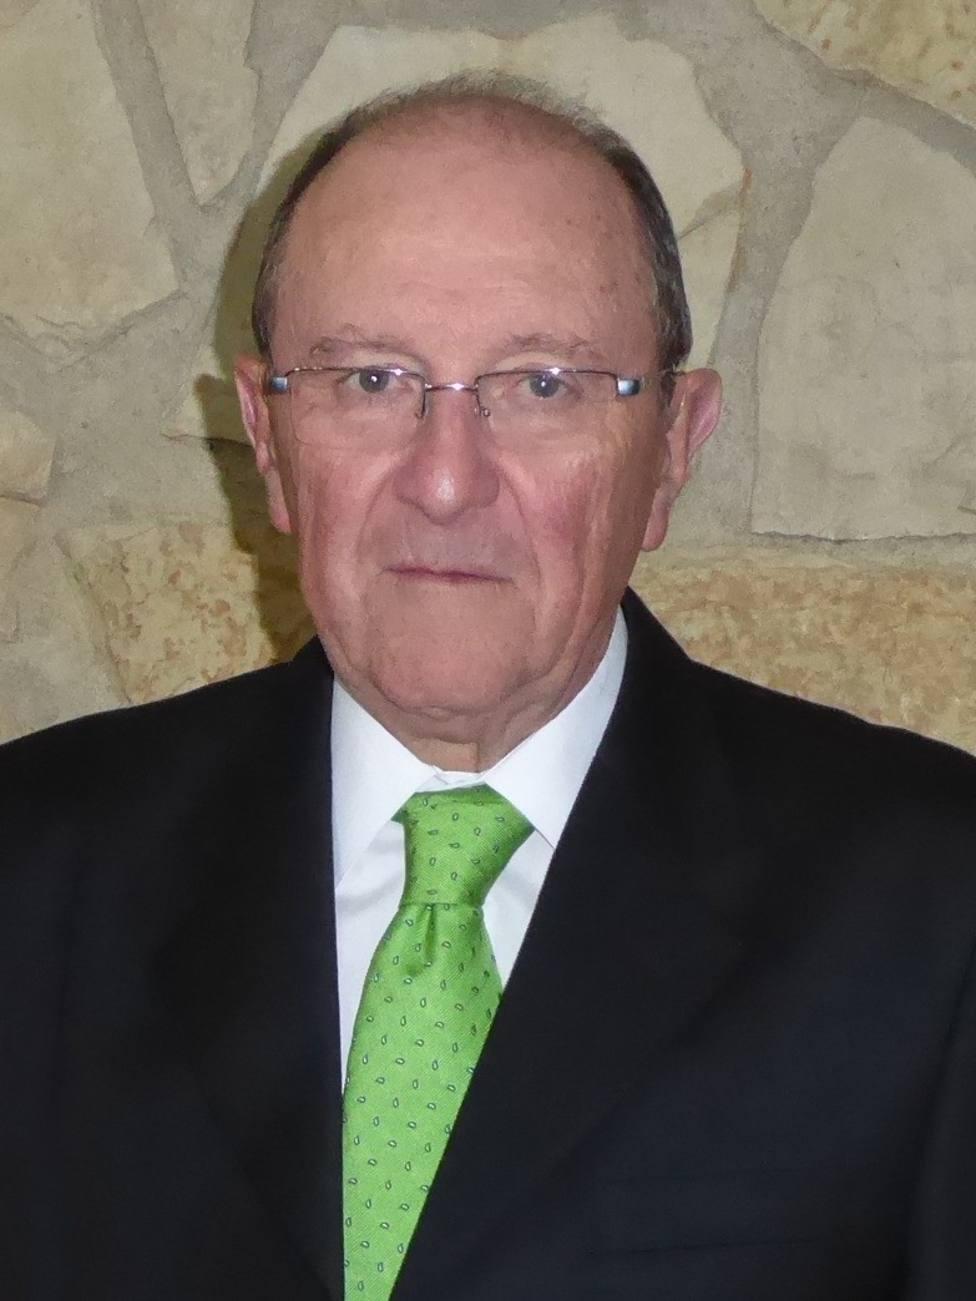 El general de la Guardia Civil Miguel Martínez, elegido pregonero de la Semana Santa de Lorca